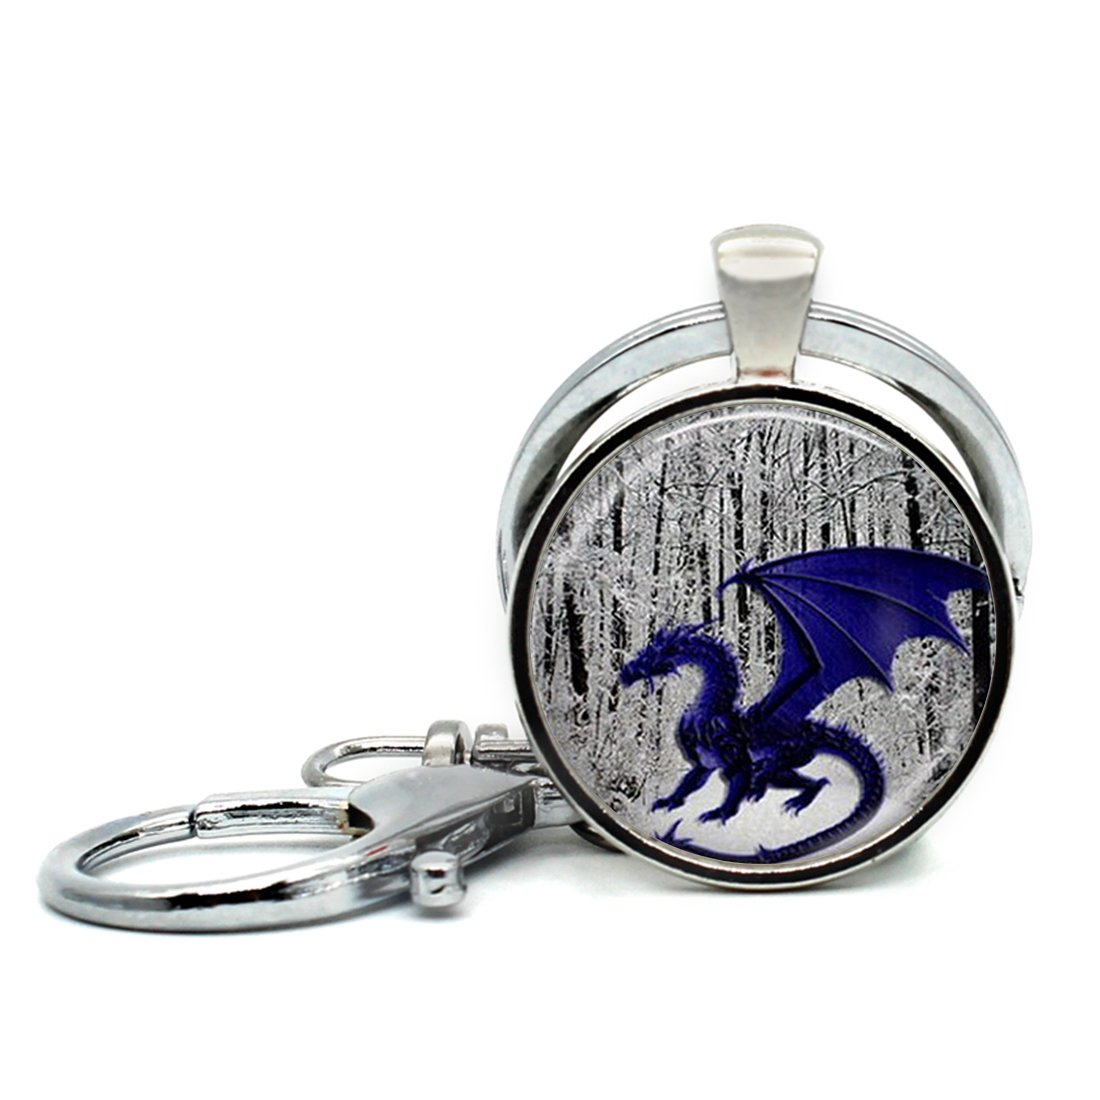 Handmade Keychain Steampunk Dragon Charm Pendant Car Circle Key Rings Gift Bag Hanging Buckle LooPoP CXC0518LooPoP-KF-LSZBS-0060